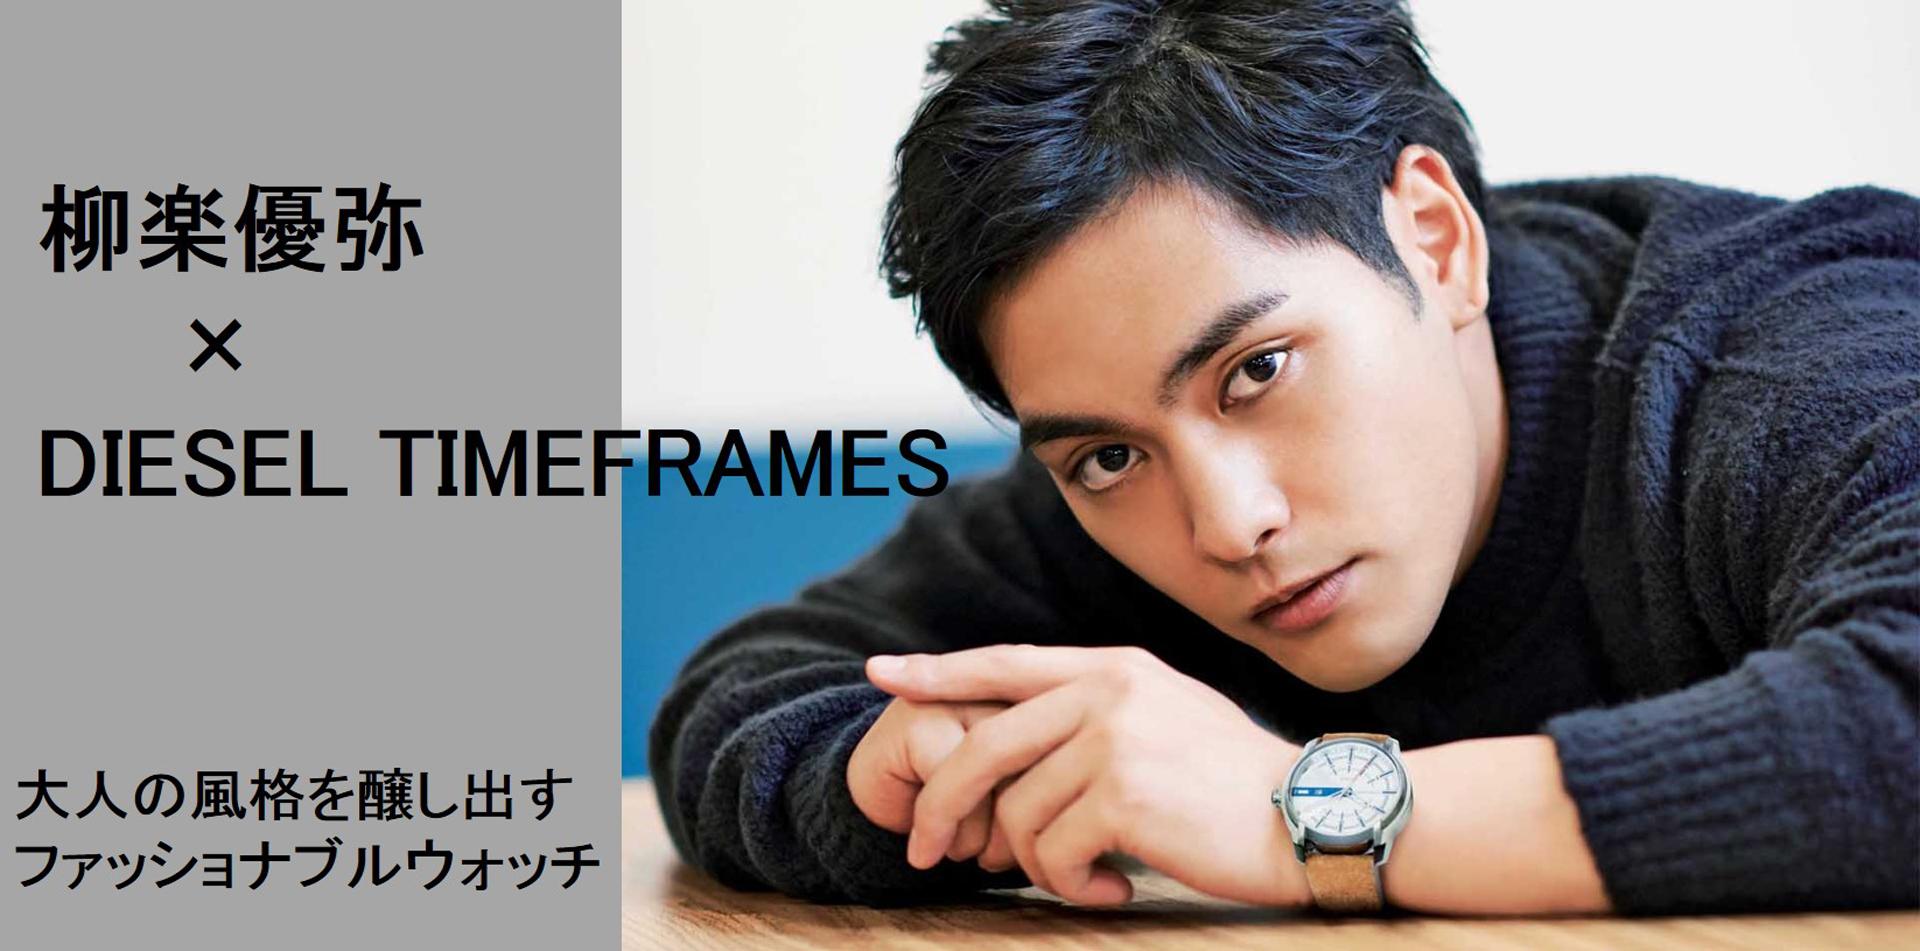 柳楽優弥×DIESEL TIMEFRAMES